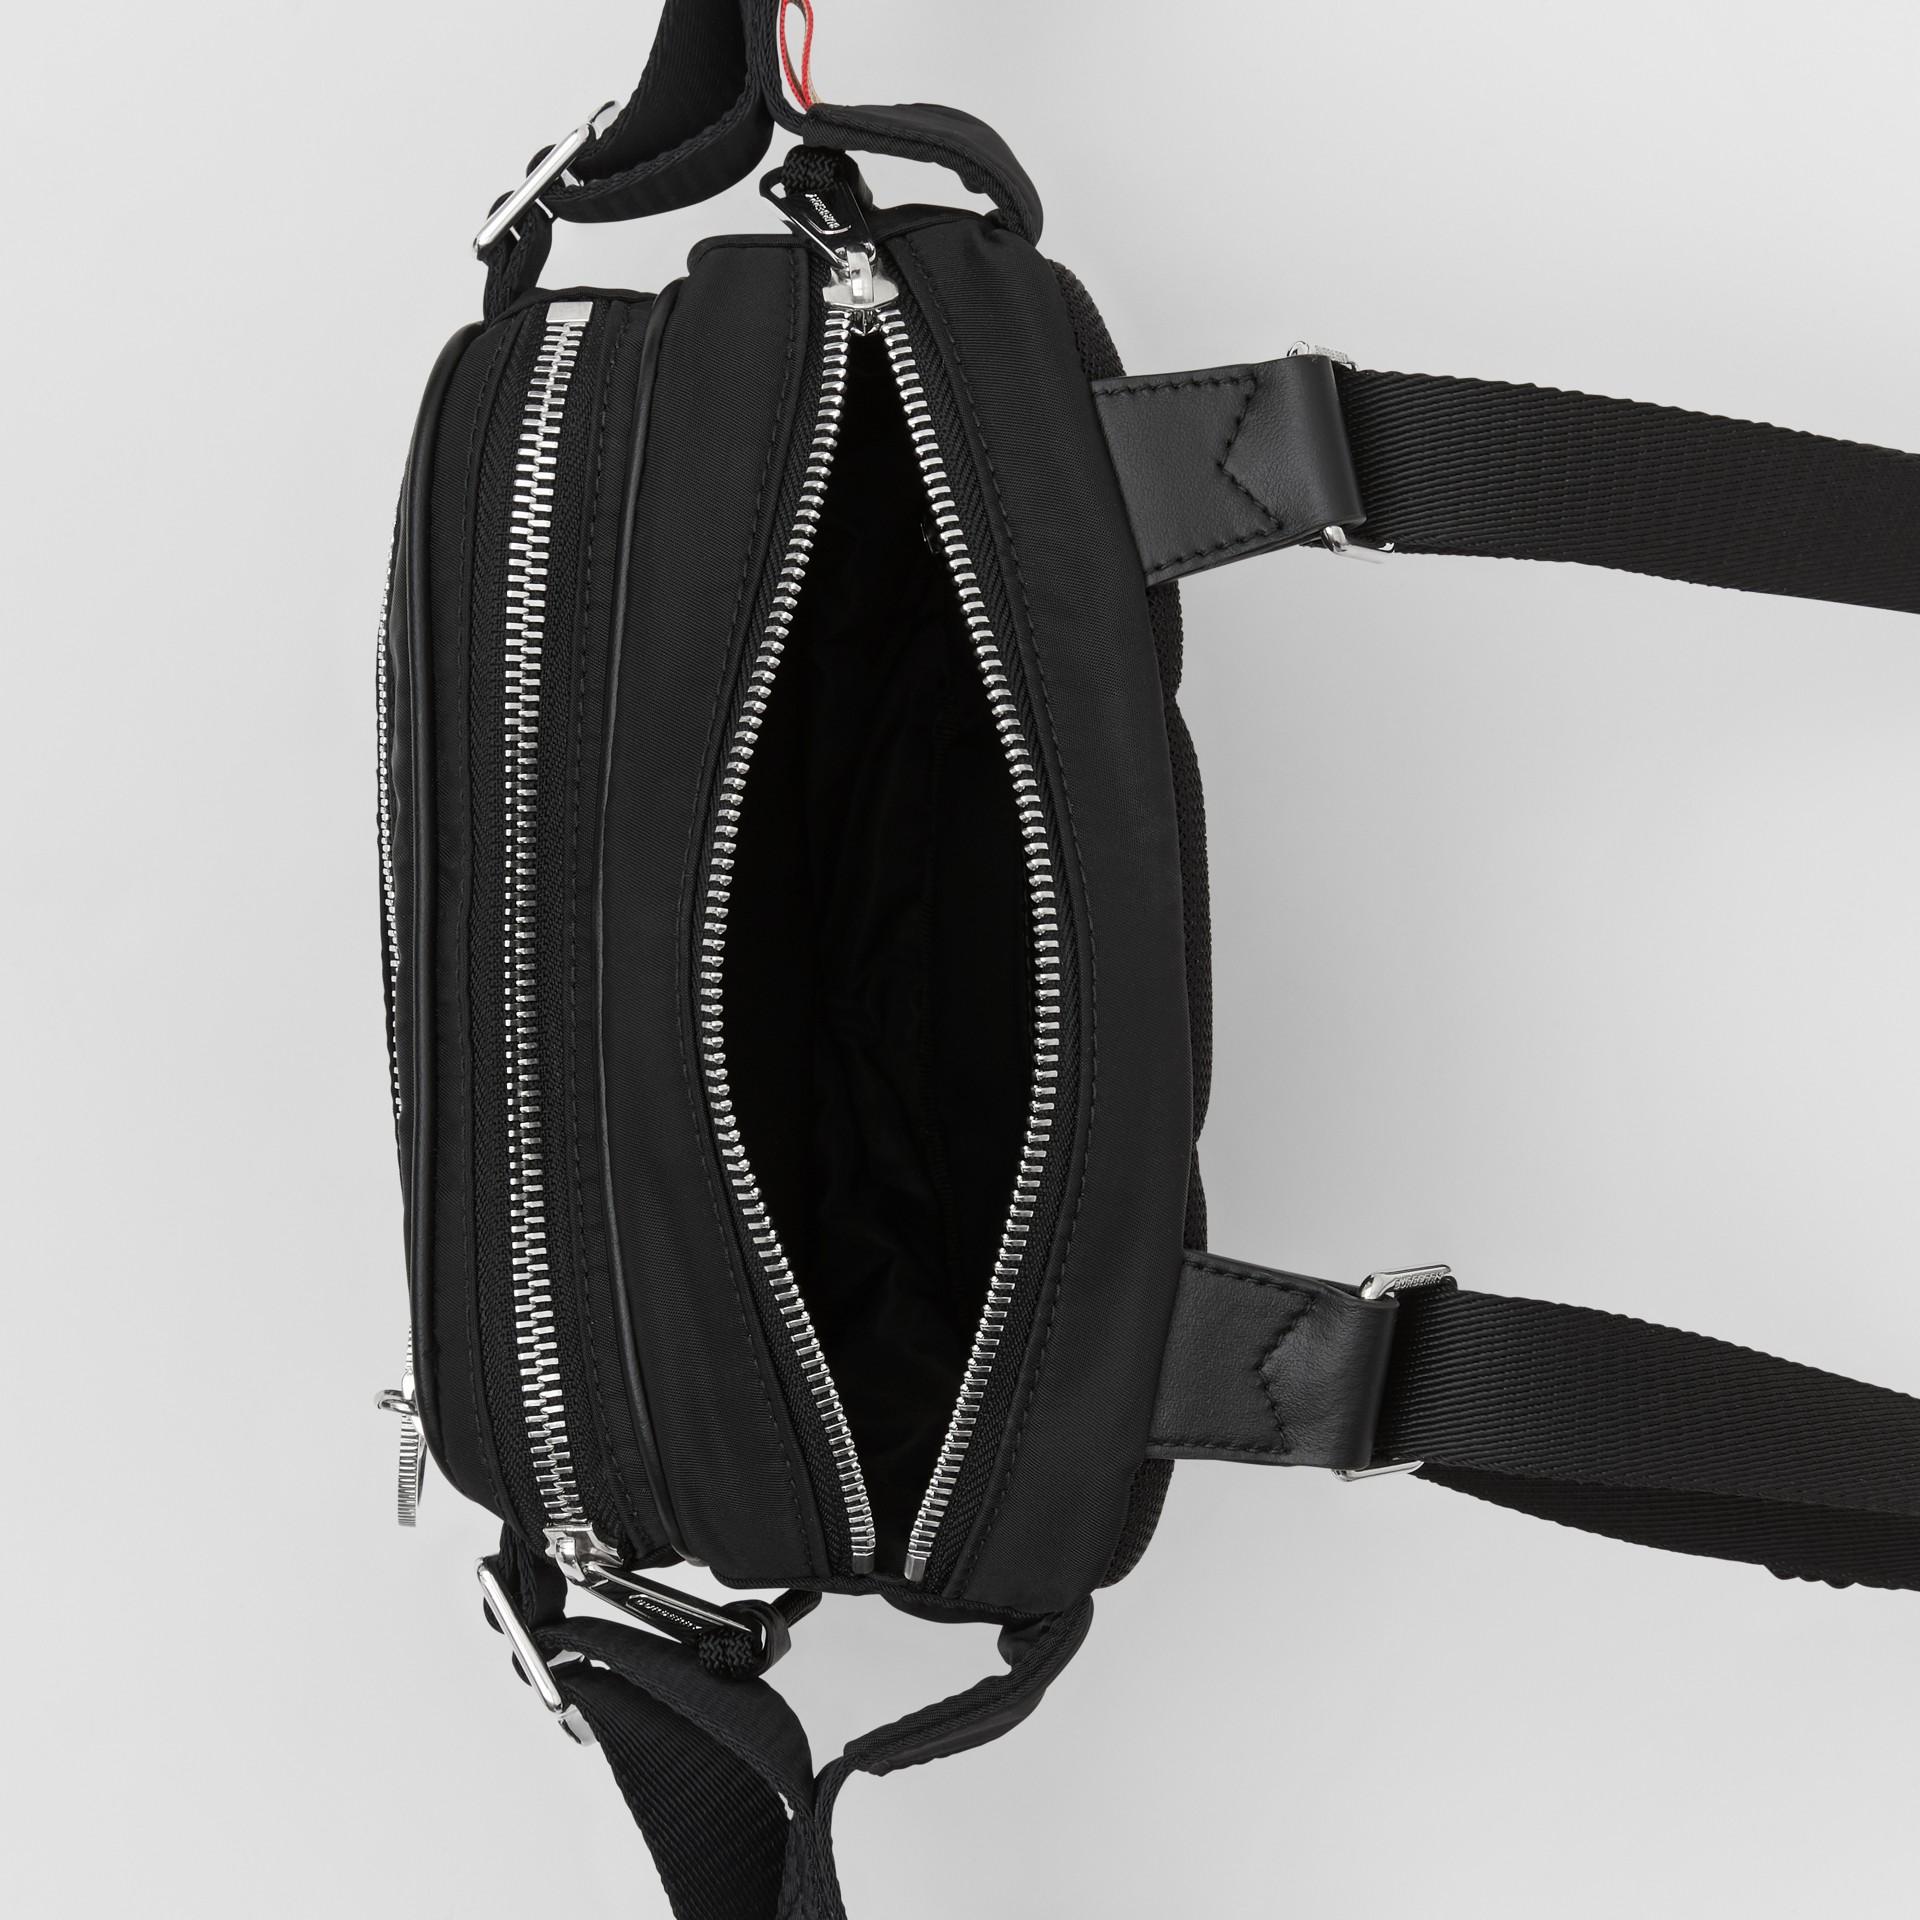 Logo Appliqué ECONYL® Cannon Belt Pack in Black | Burberry - gallery image 5